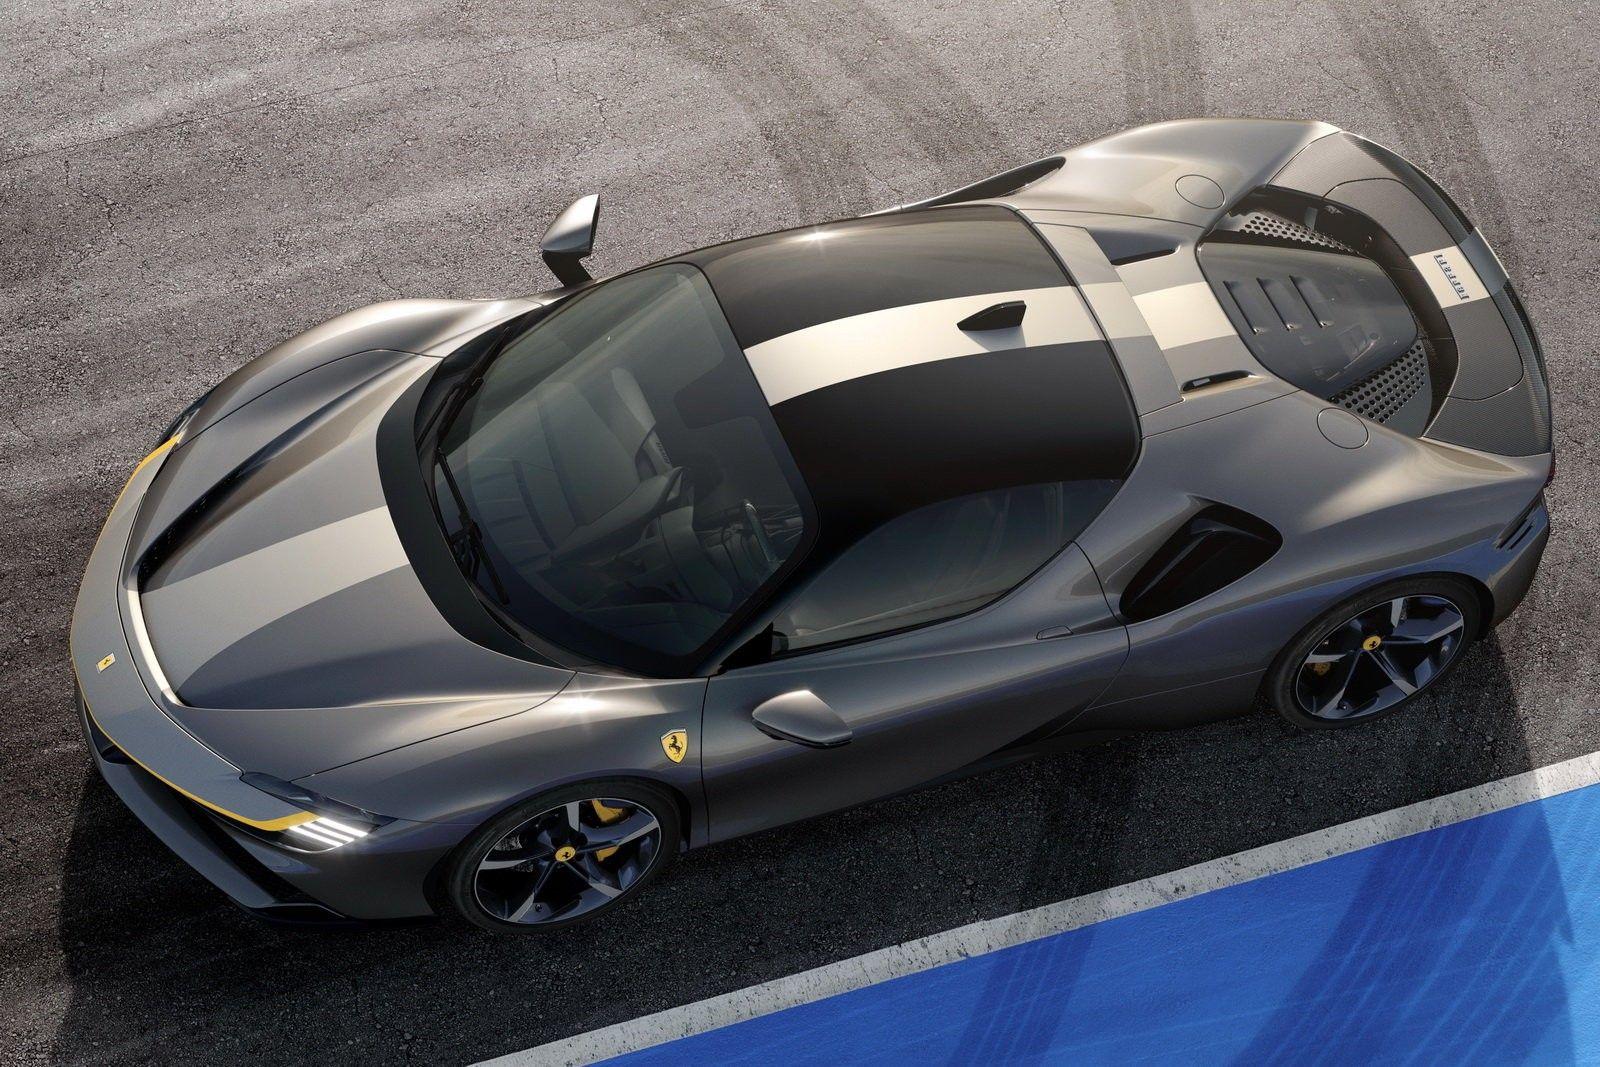 Ferrari Sf90 New Ferrari Hybrid Car